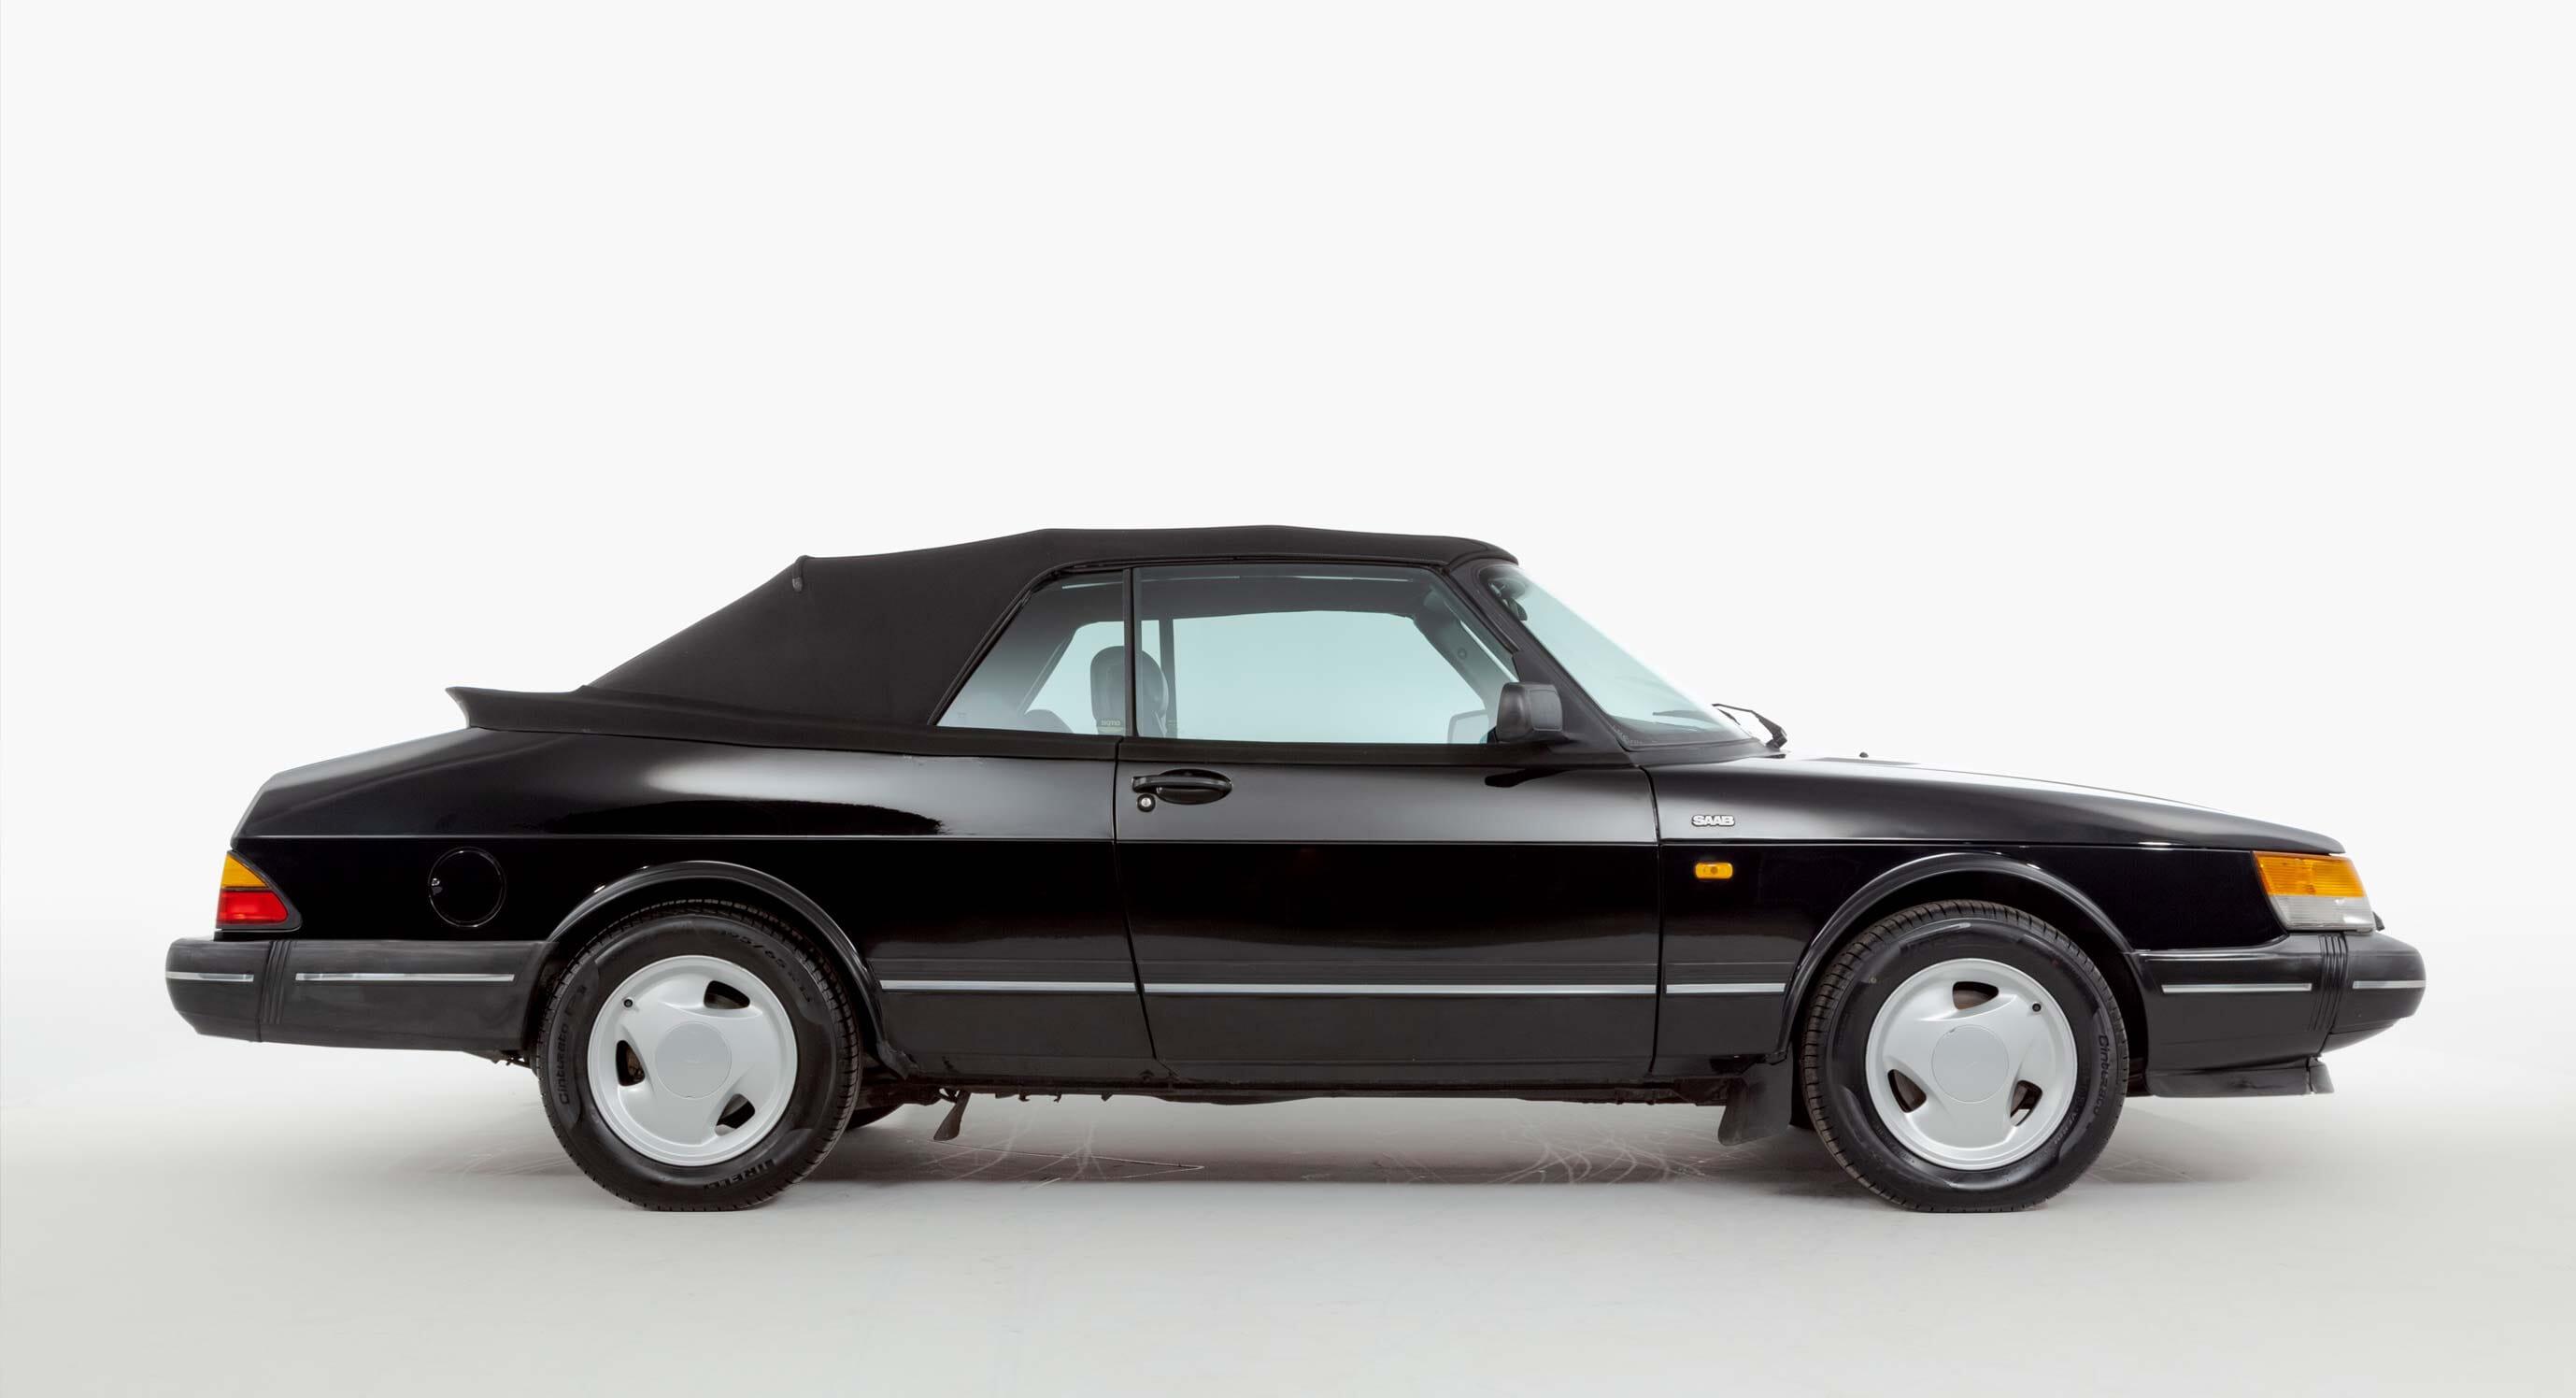 This Saab 900I 16v Cabriolet Harks Back To The Golden Age